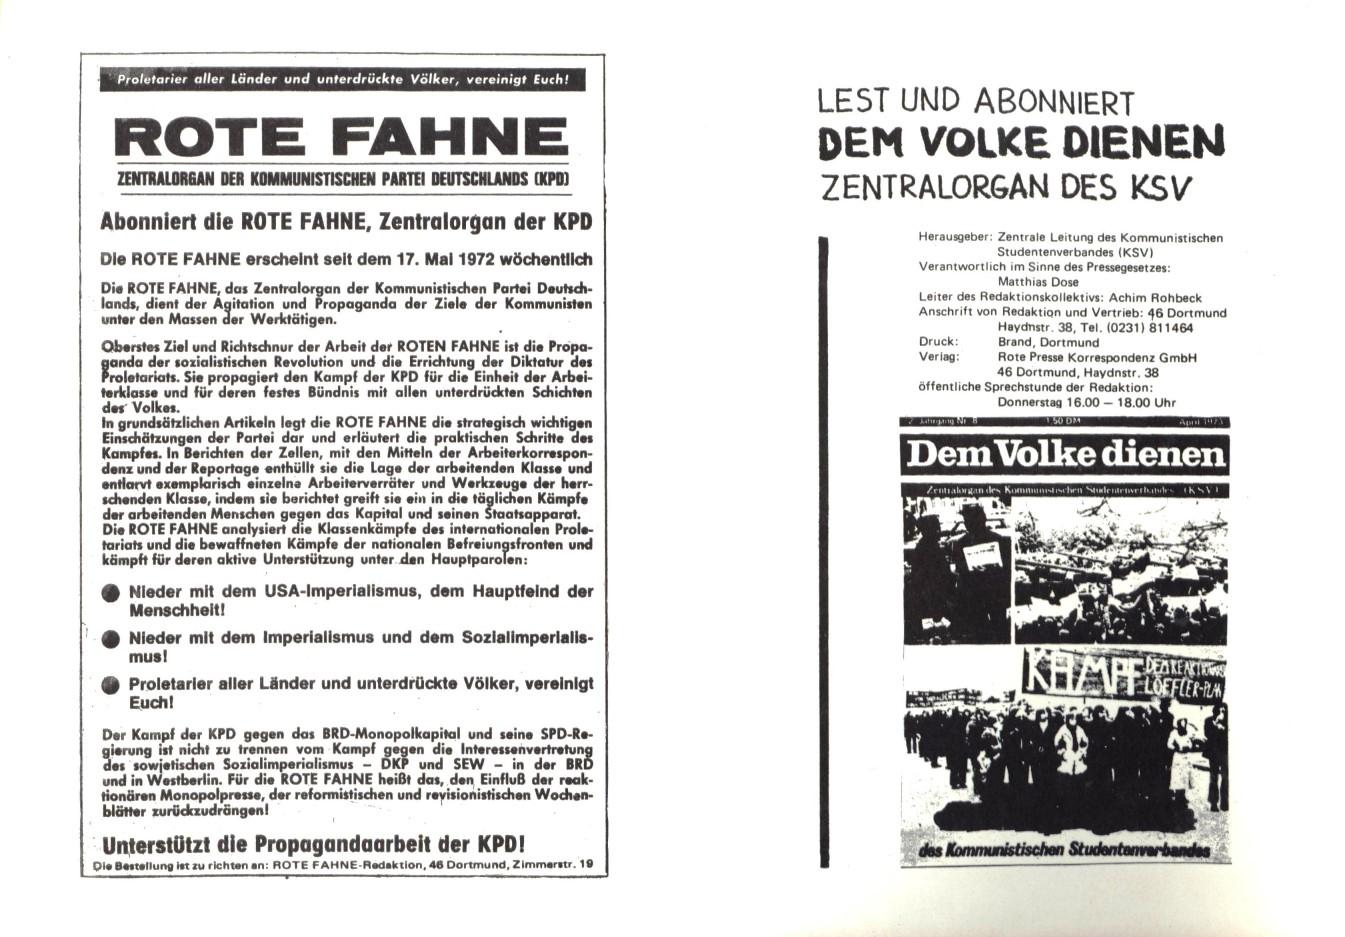 Berlin_KSV_1974_Rote_Bauwochen_73